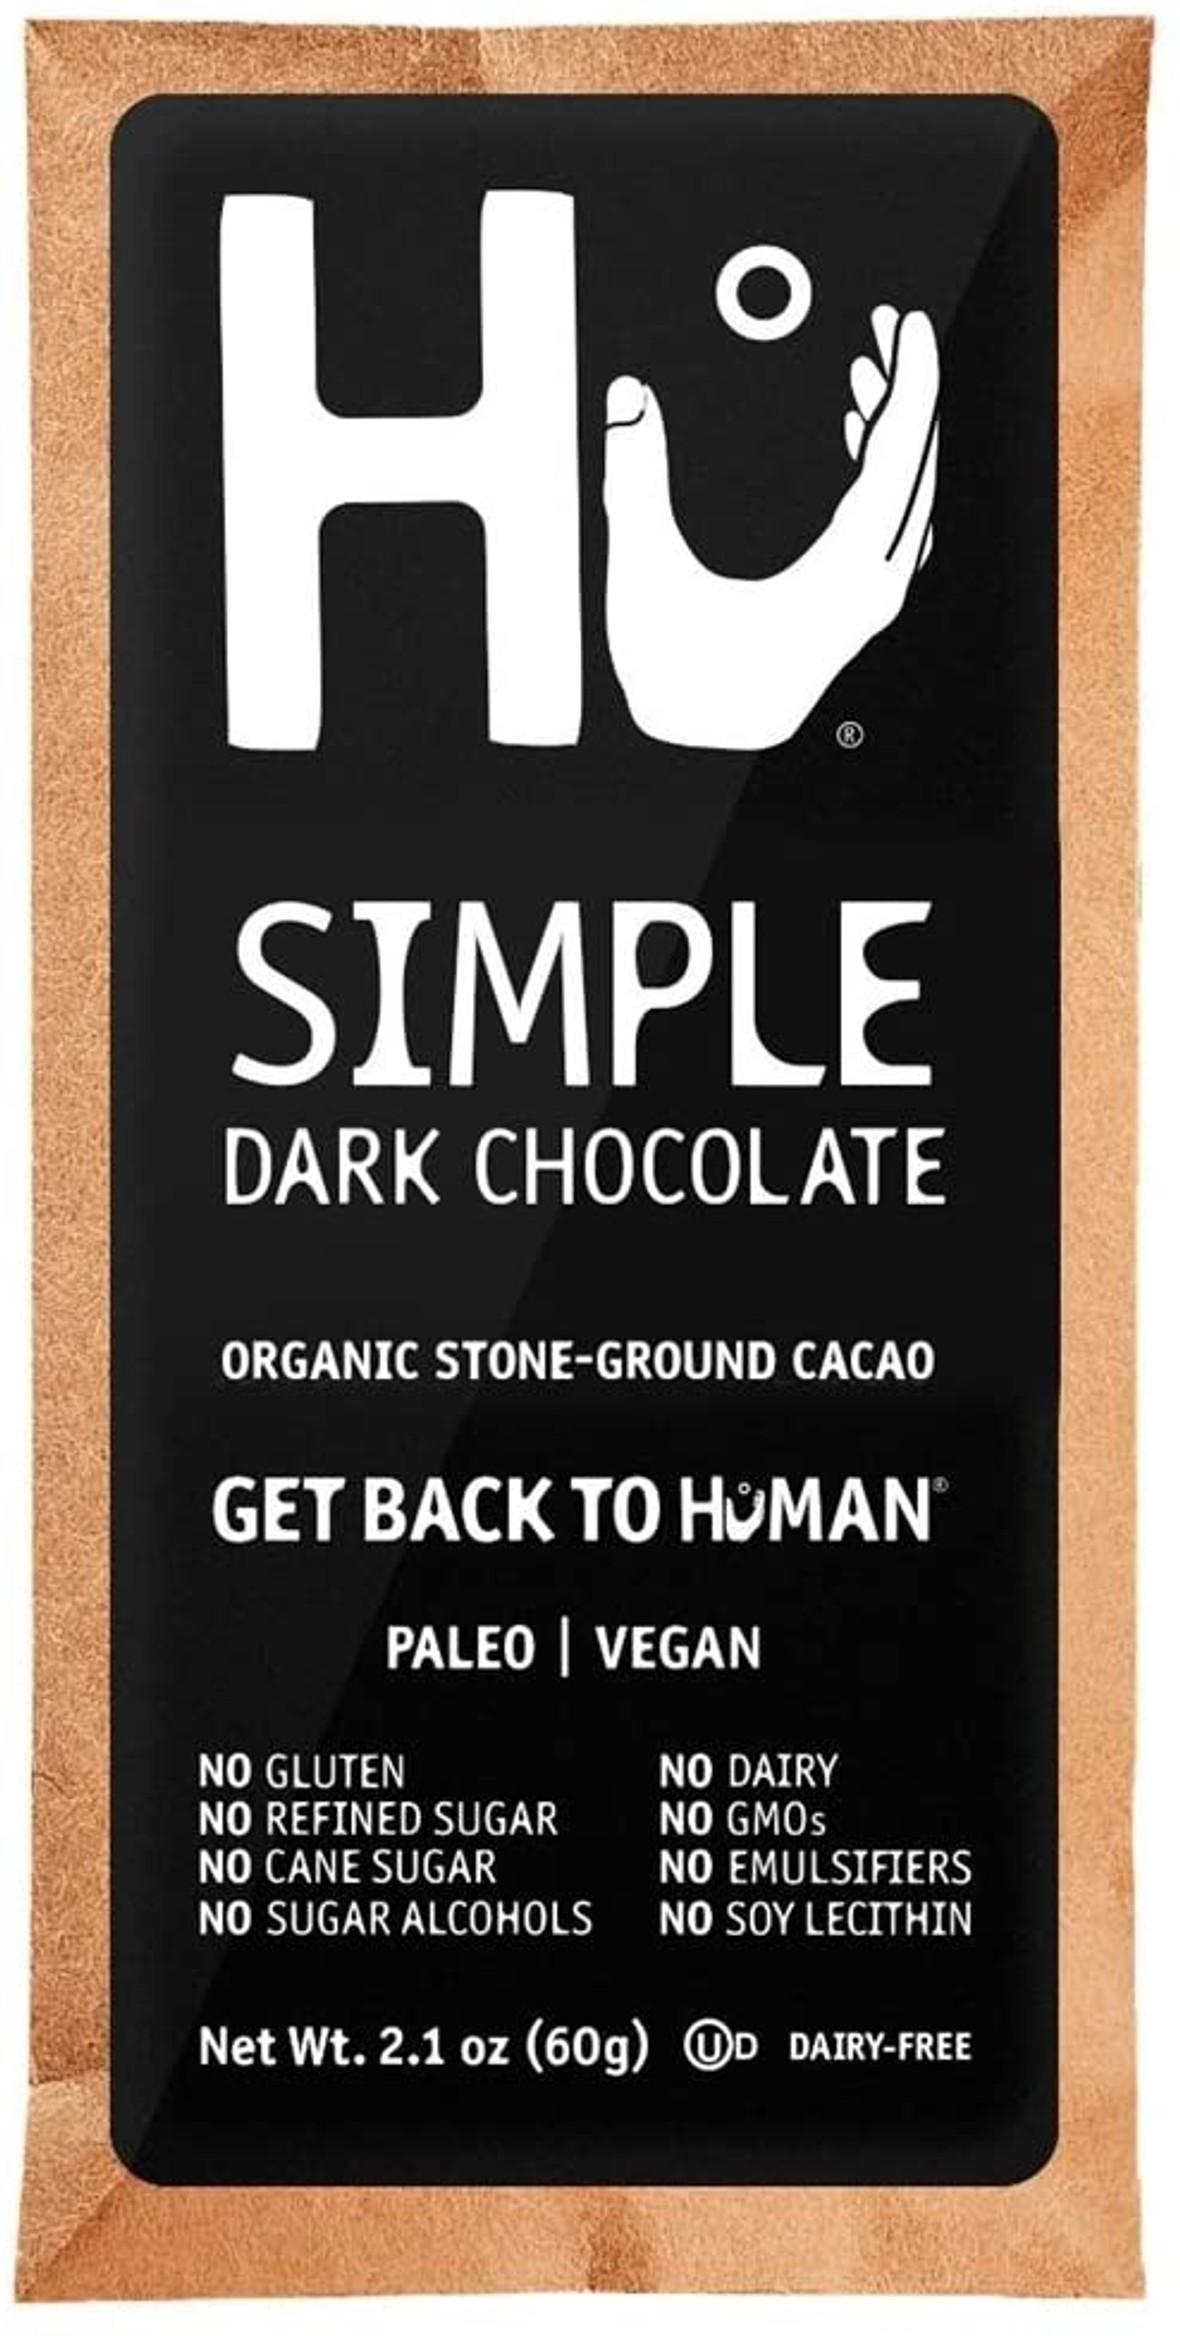 Hu Organic 70% Vegan Dark Chocolate Simple Bar, 2.1 Oz (24 Packs)